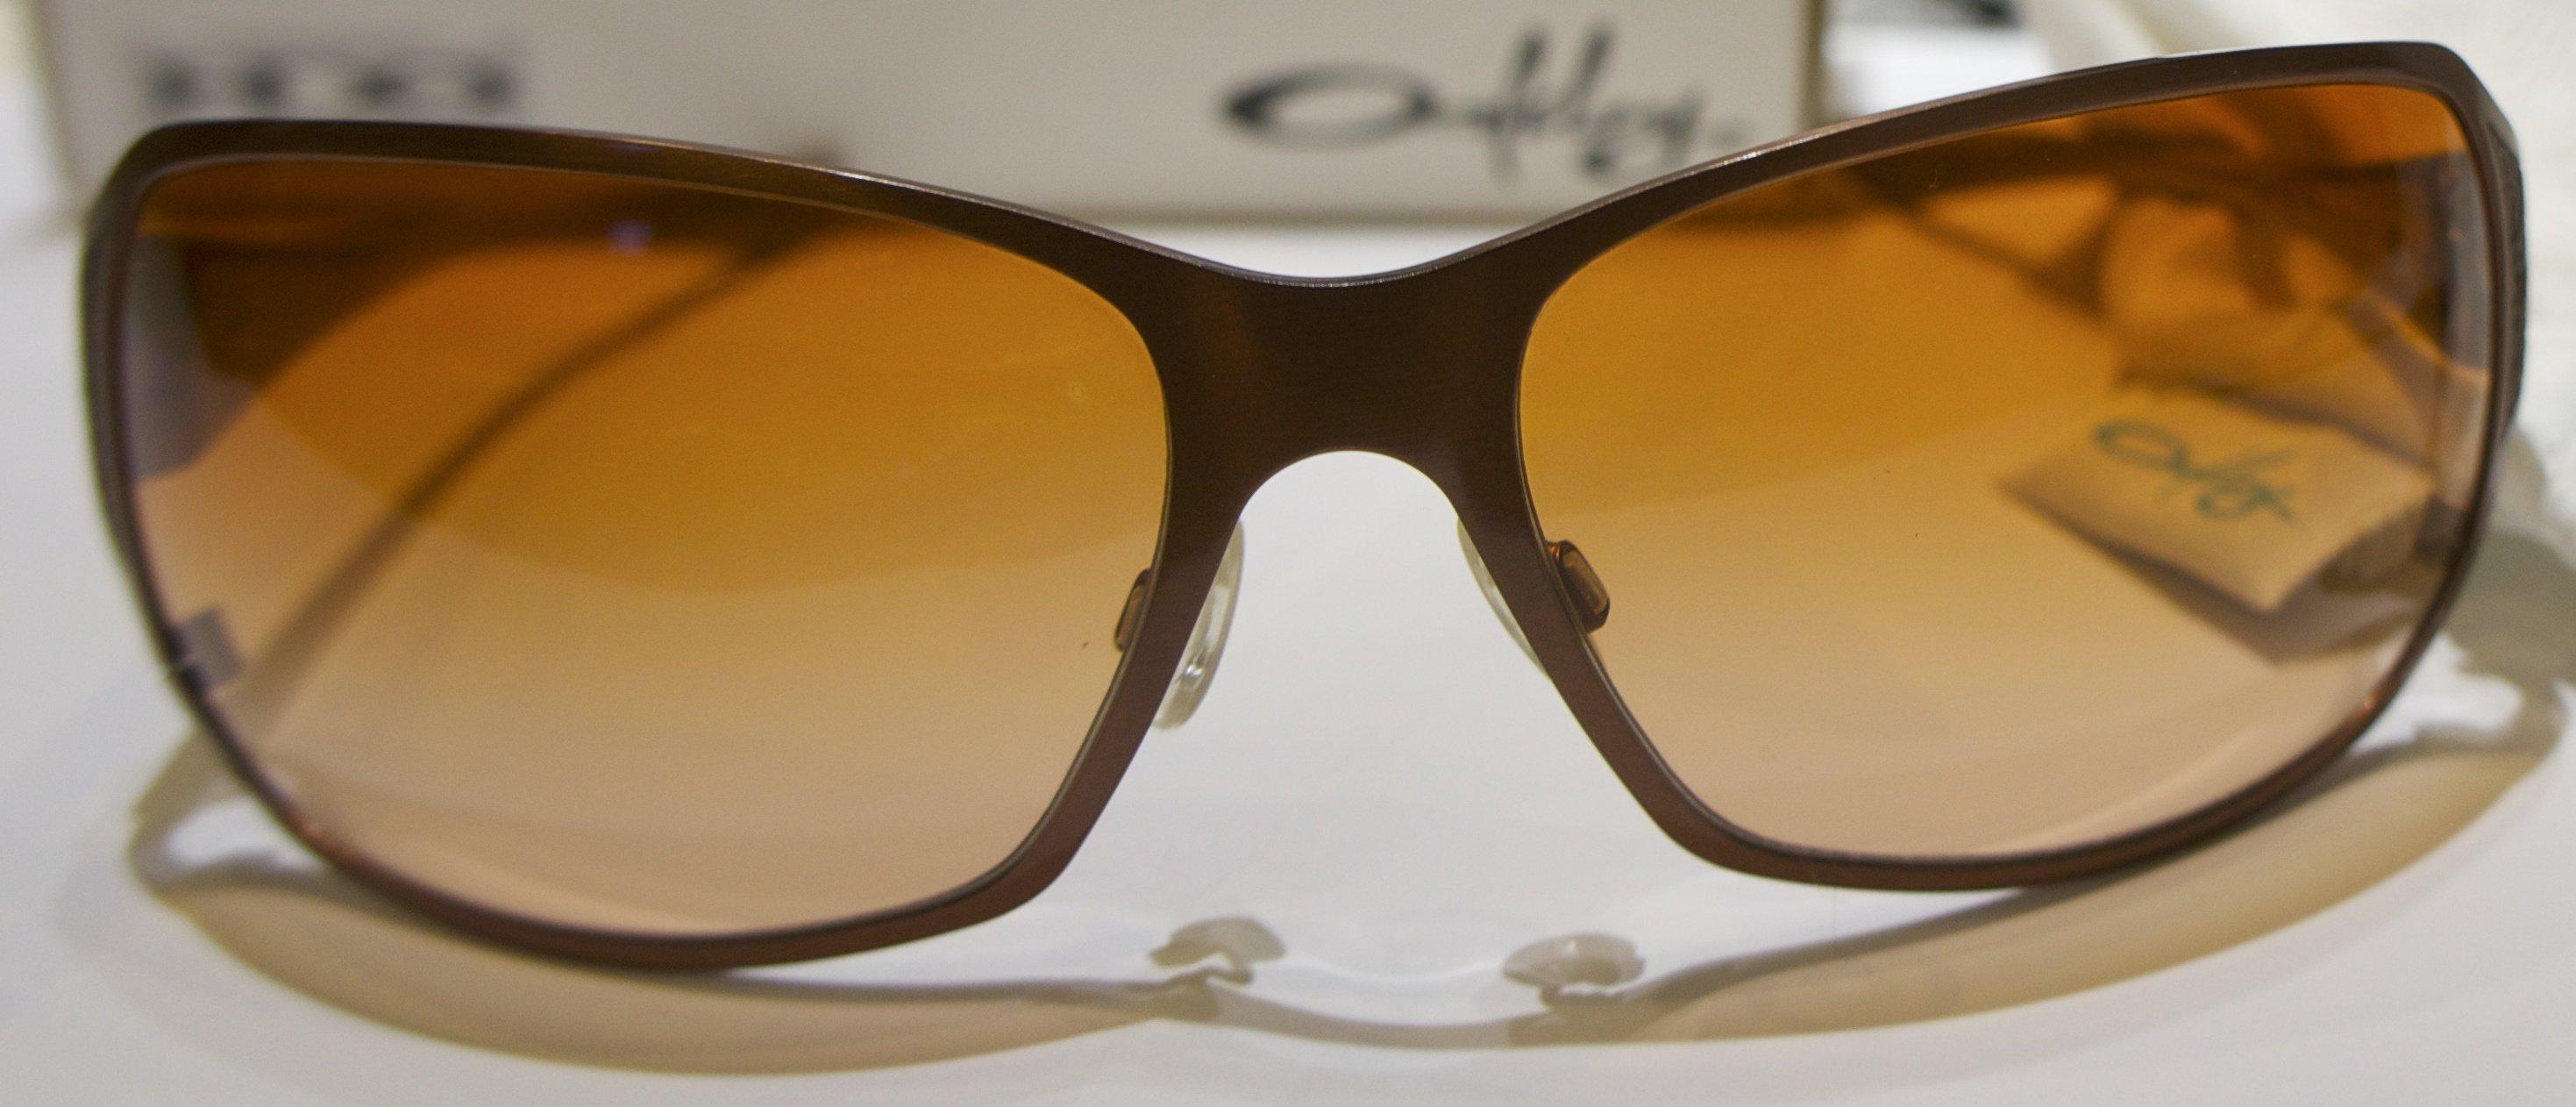 Oakley Behave - Brushed Bronze - VR50 Brown Gradient (DIFETTATE)